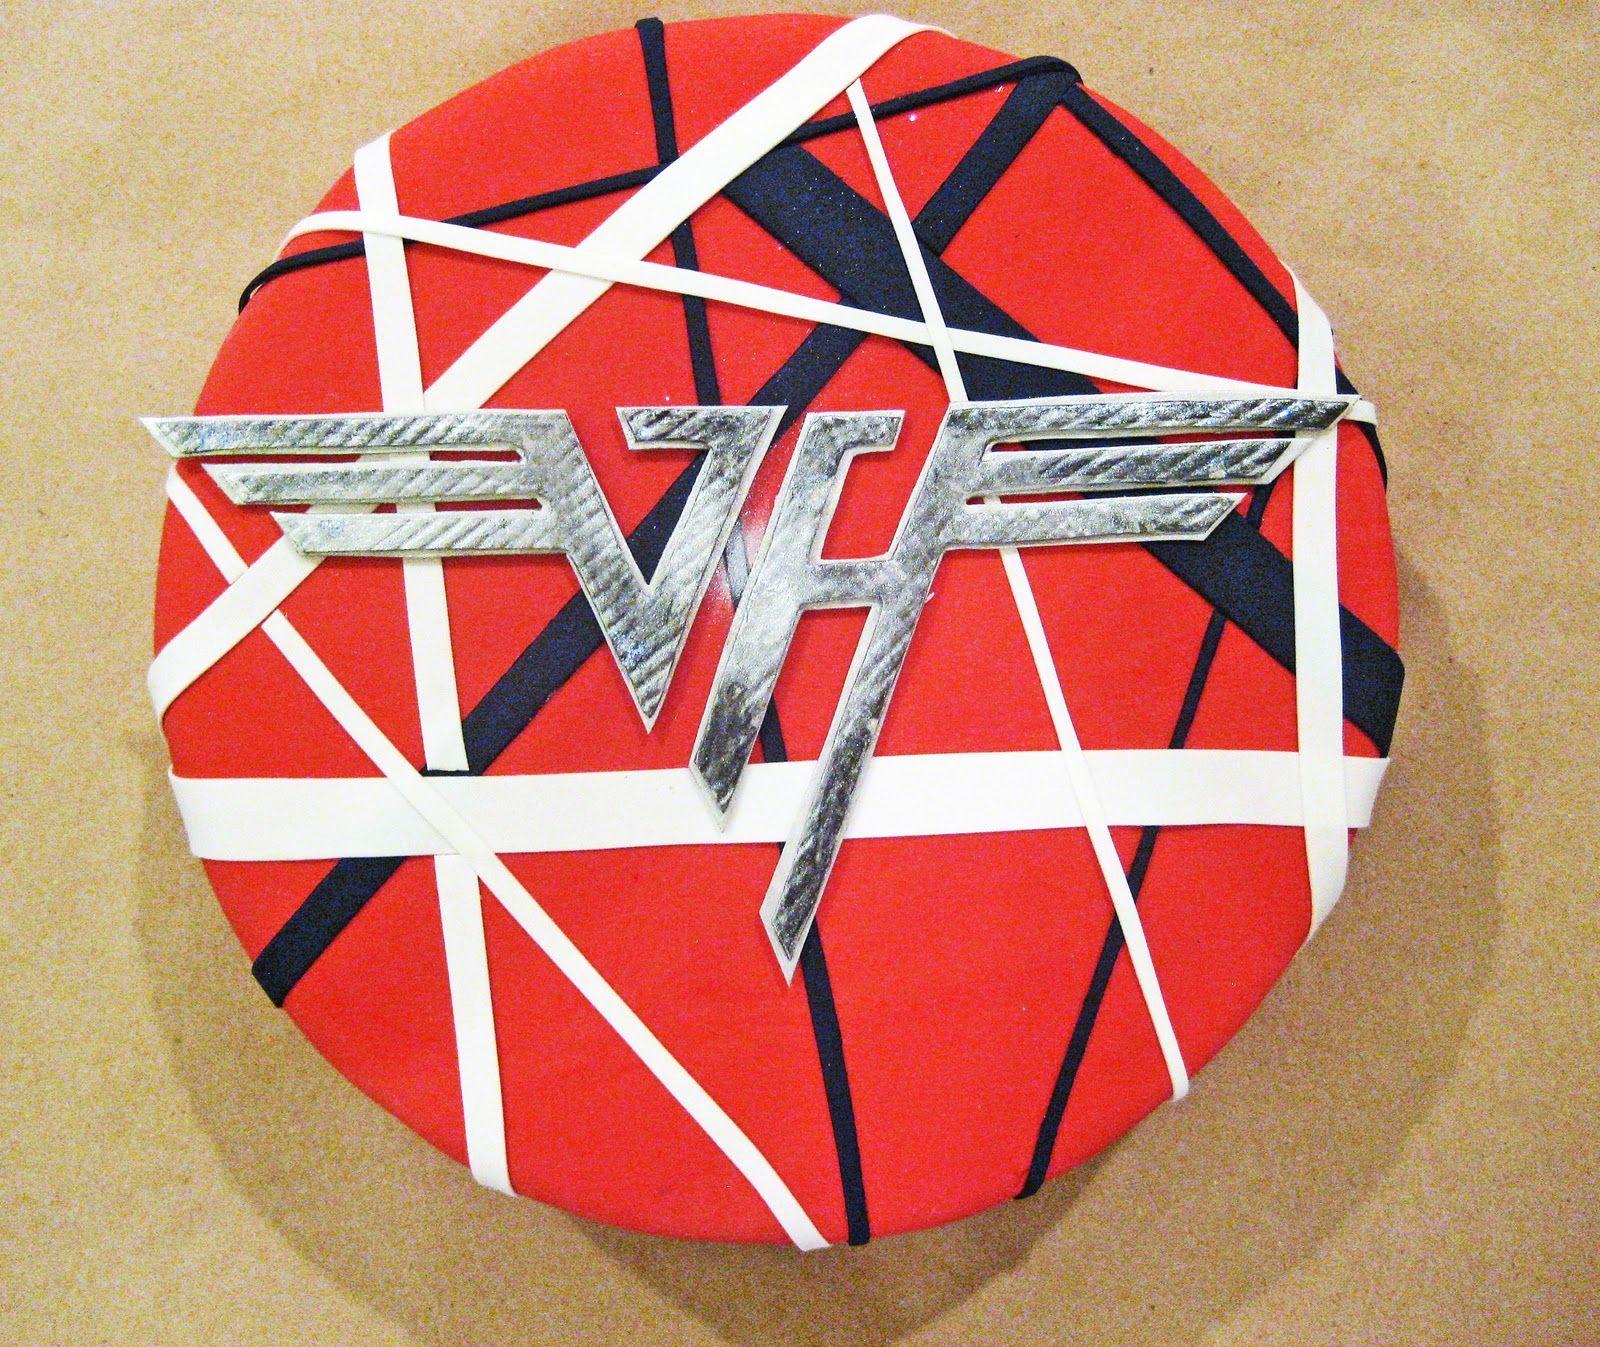 Van Halen Cake By Cake Hero Www Cakehero Com Vanhalen Cake Funny Birthday Cakes Van Halen My Birthday Cake